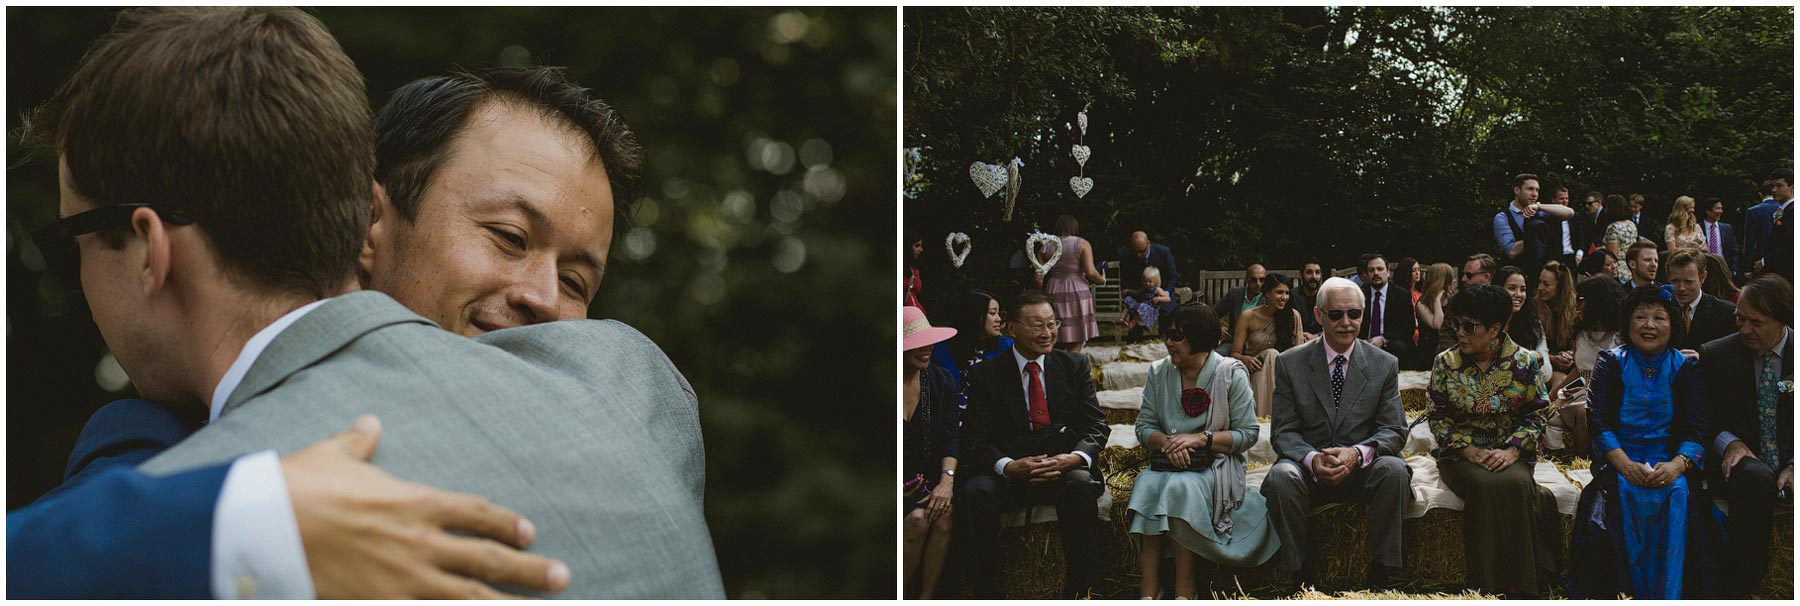 Colehayes-Park-Wedding-Photography_0053